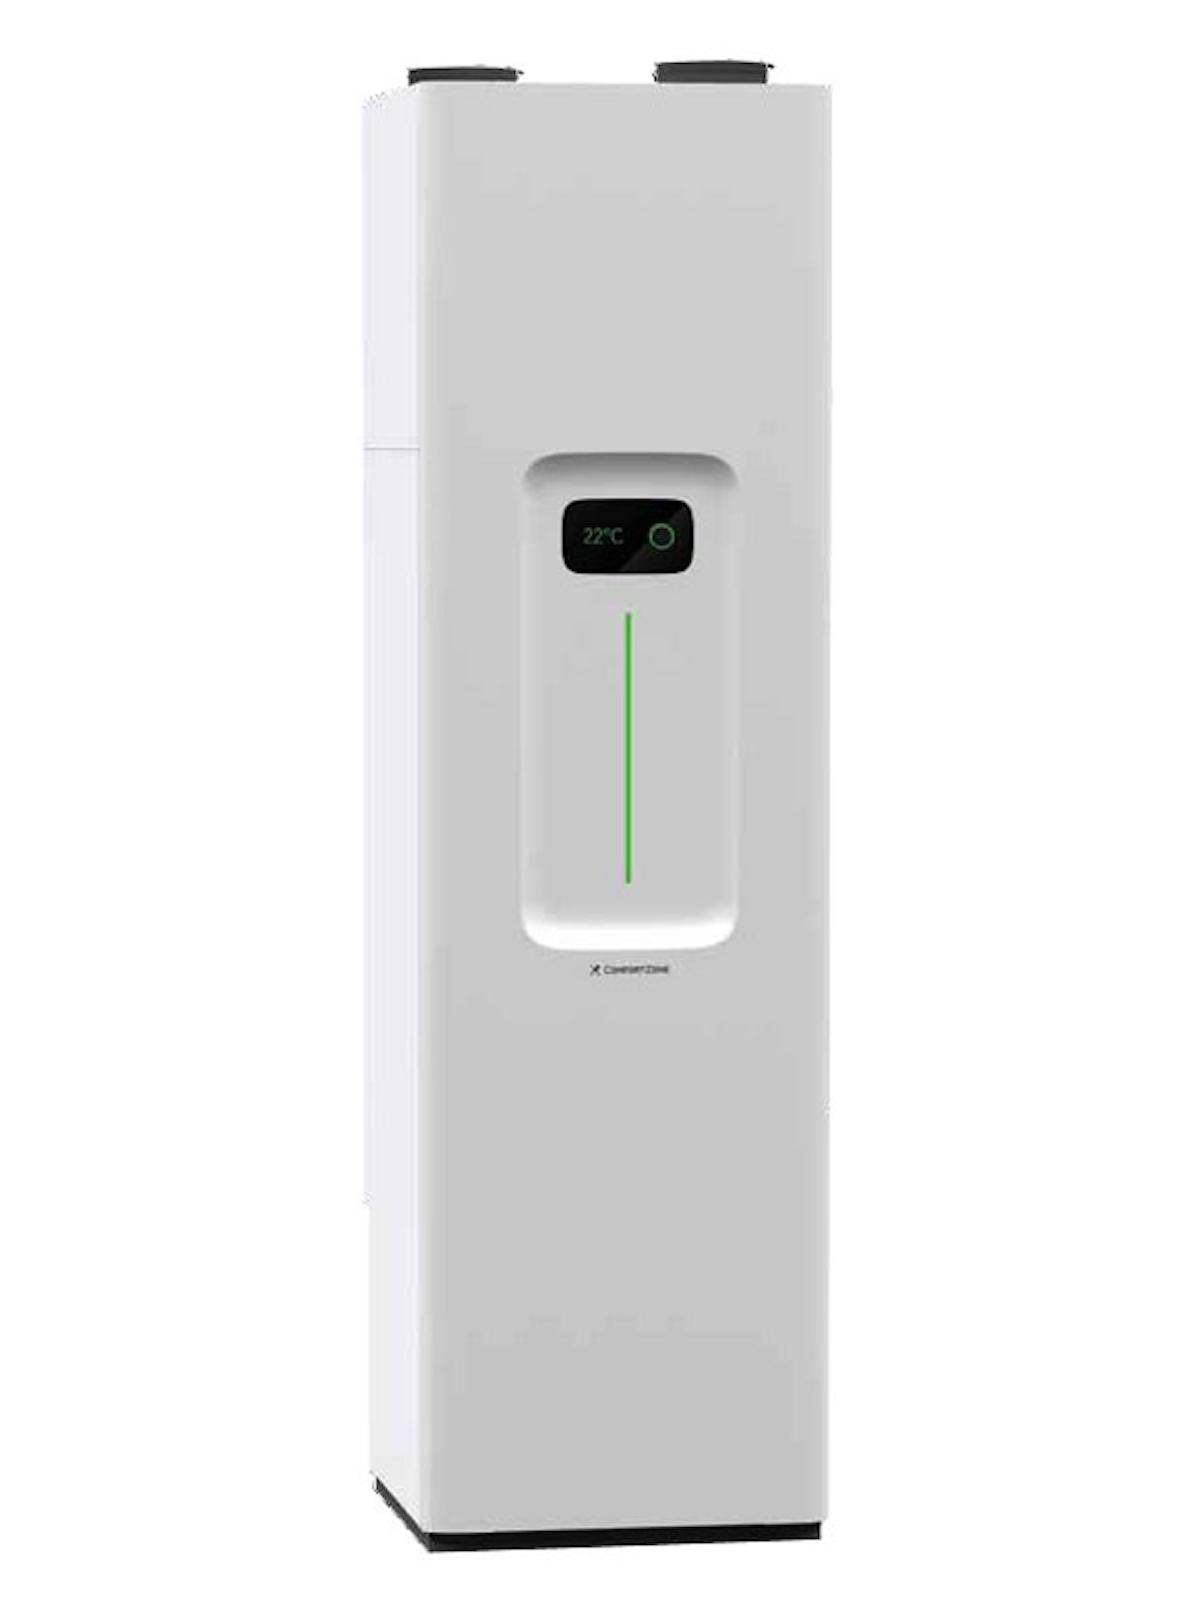 Exhaust air heat pump RX50